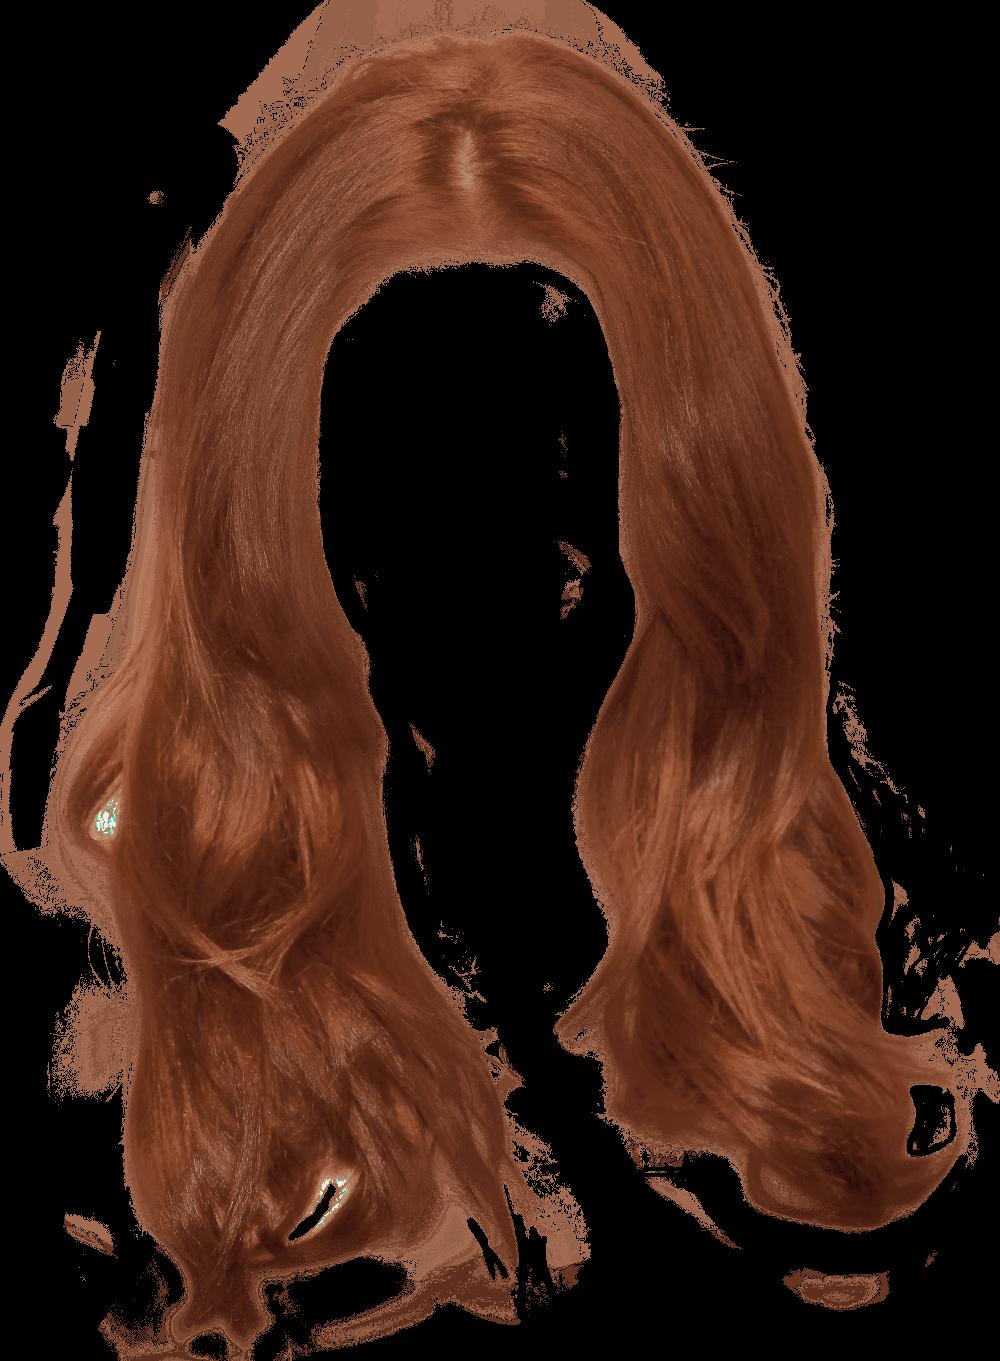 Hair PNG - 23548